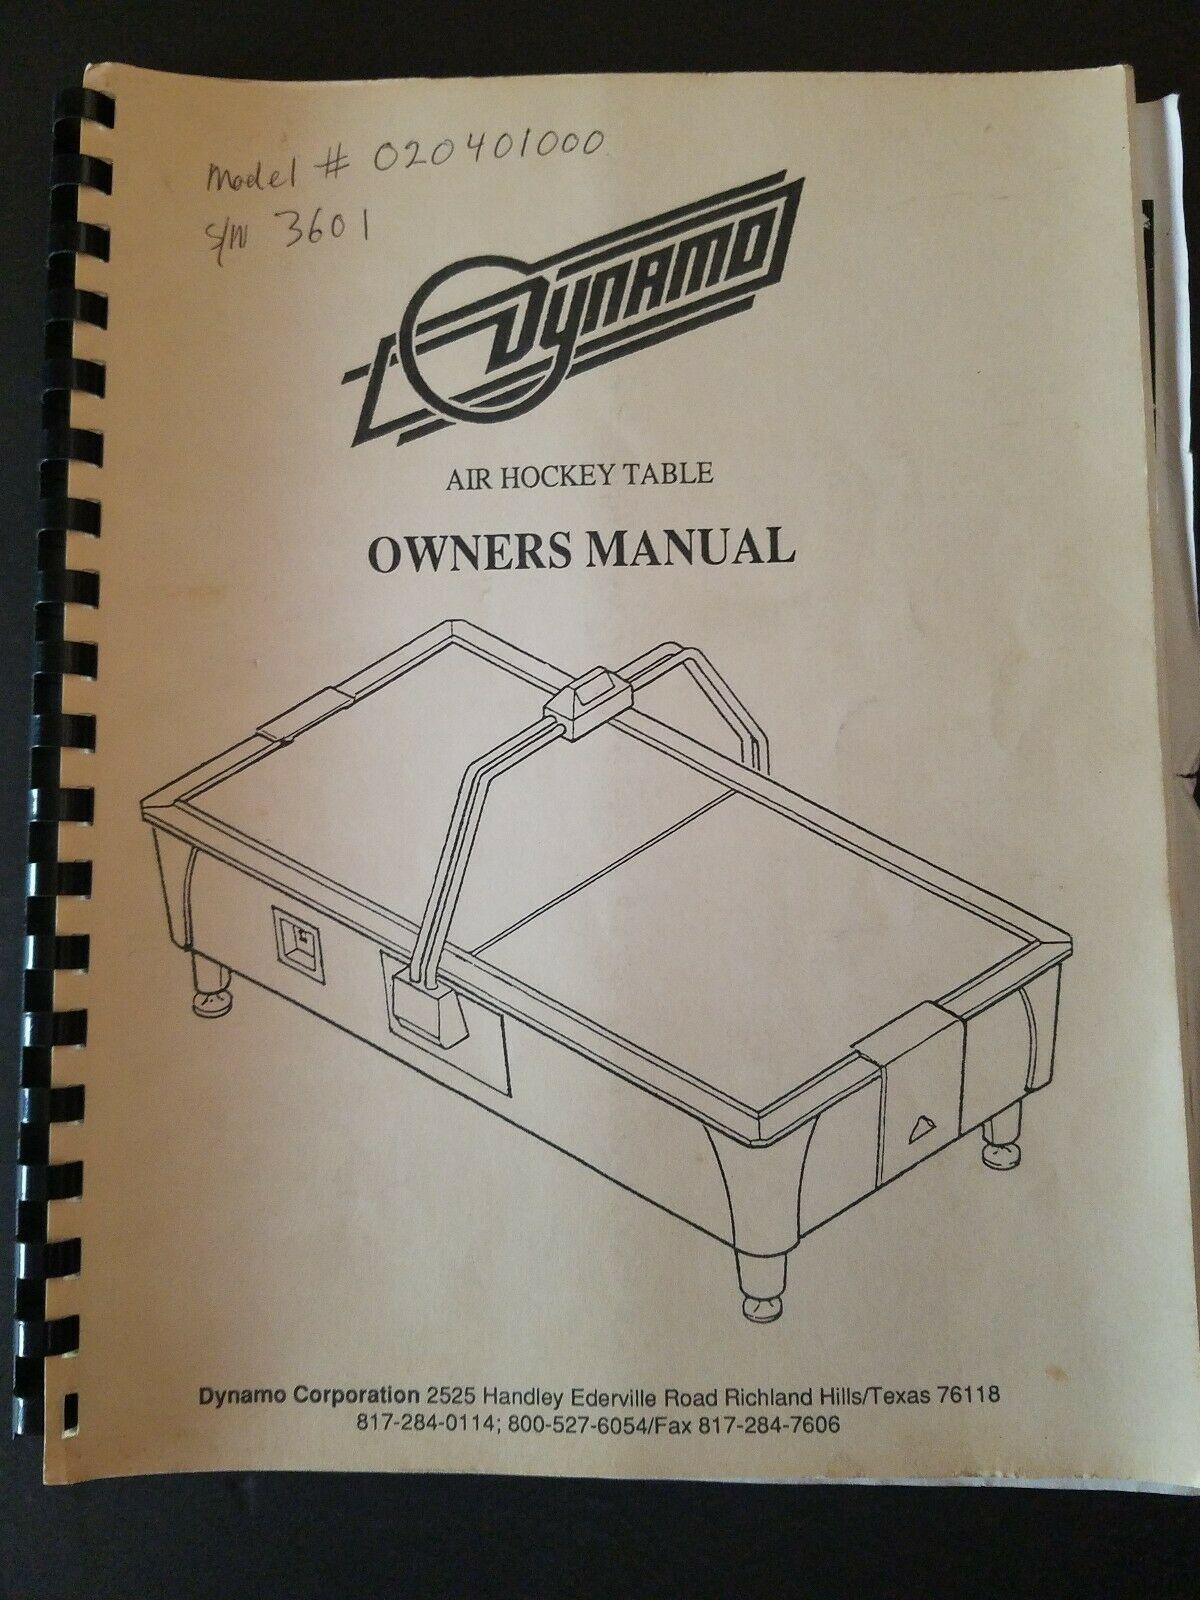 Original Dynamo Air Hockey Table Owners Manual 17.99 Air